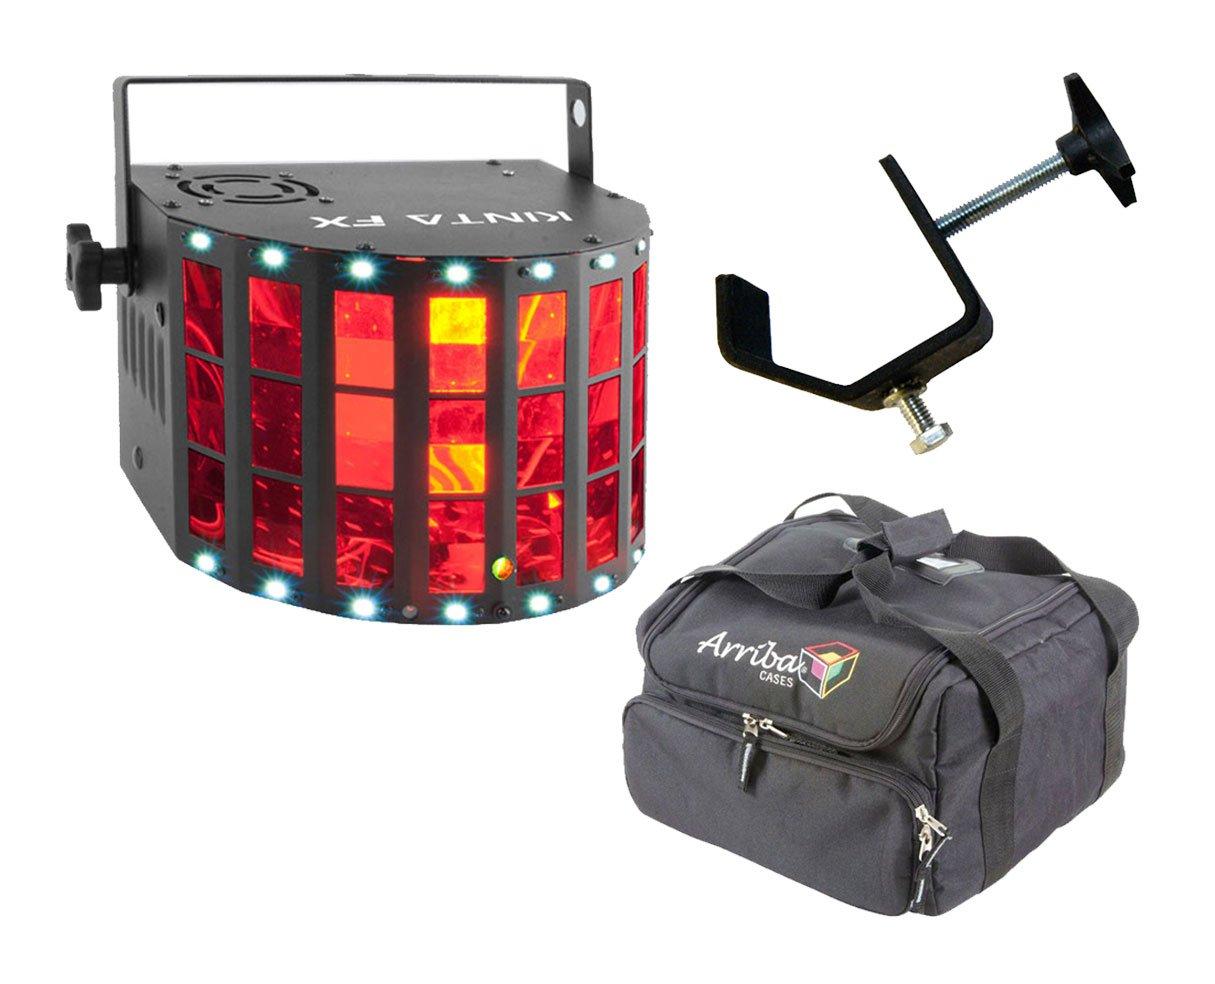 Chauvet Kinta FX LED Derby Effect Laser Strobe Light + Travel Bag + Clamp by CHAUVET DJ